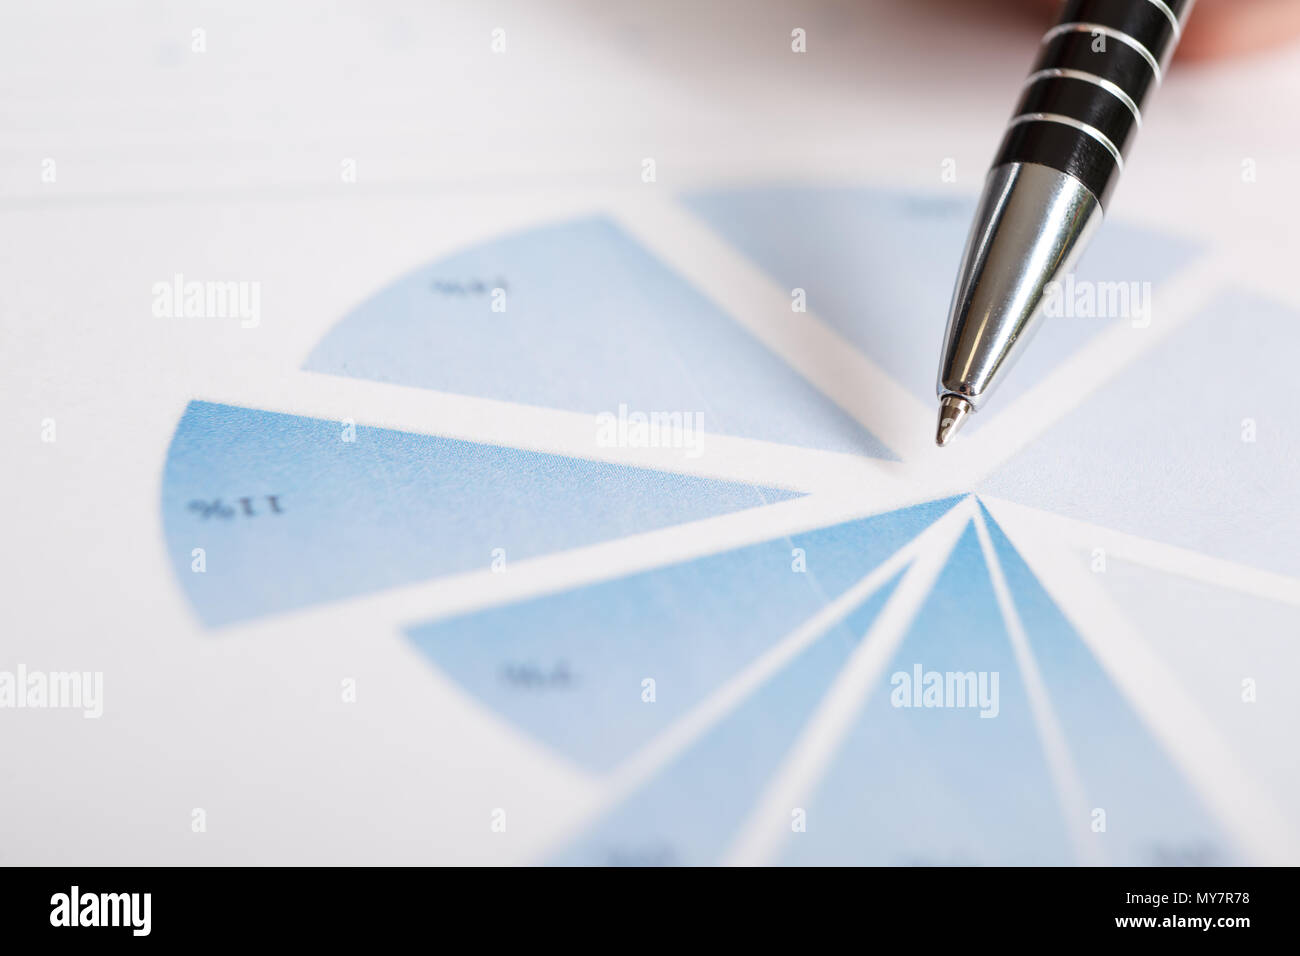 Pen on graph. Macro image.Financial data analysis concept Stock Photo